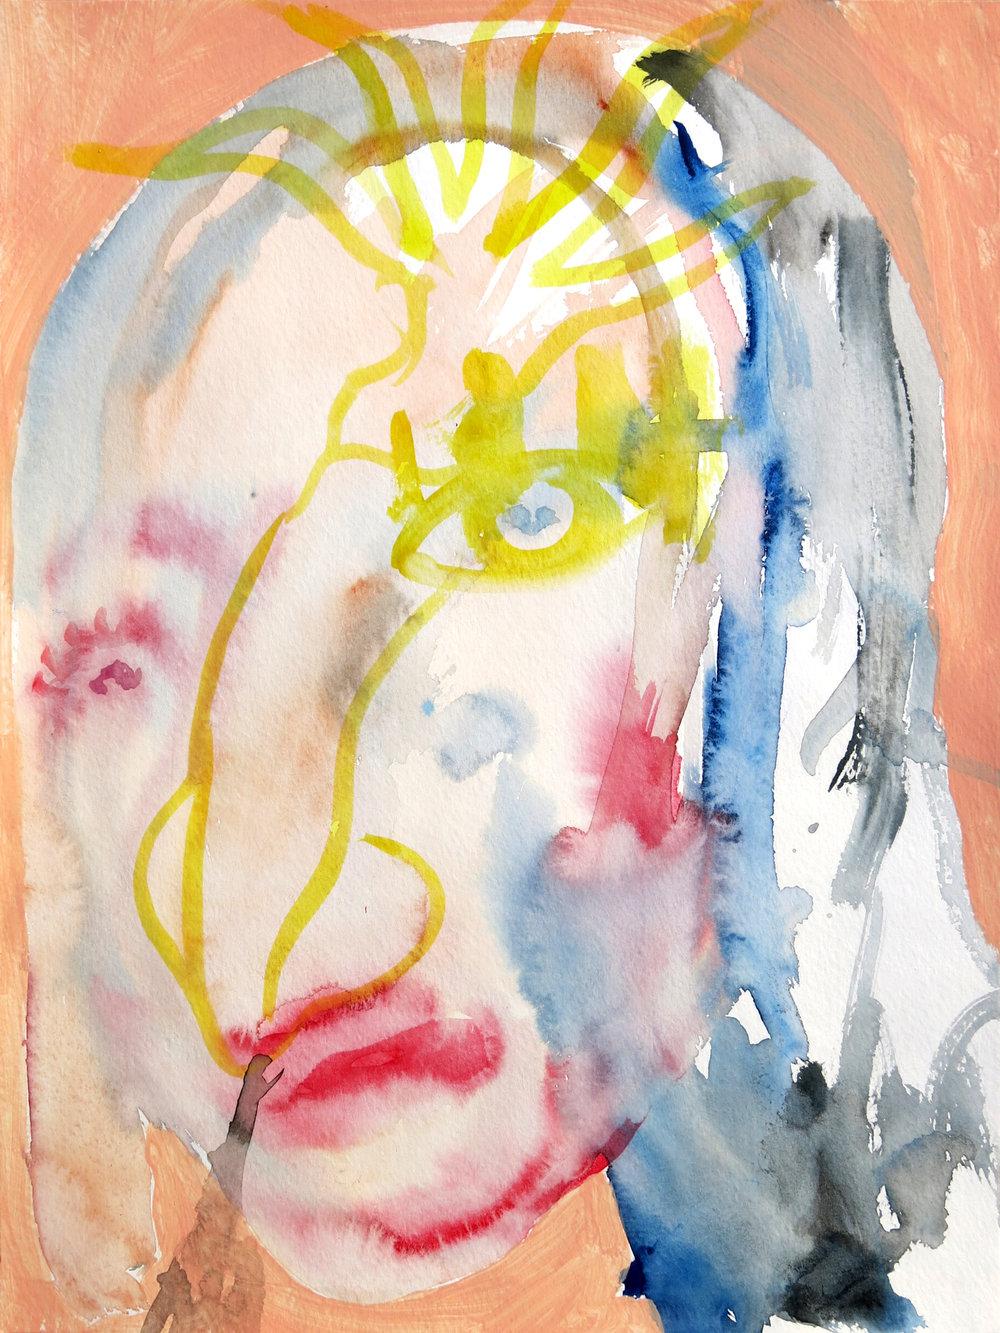 Barbra Streisand Portrait #42